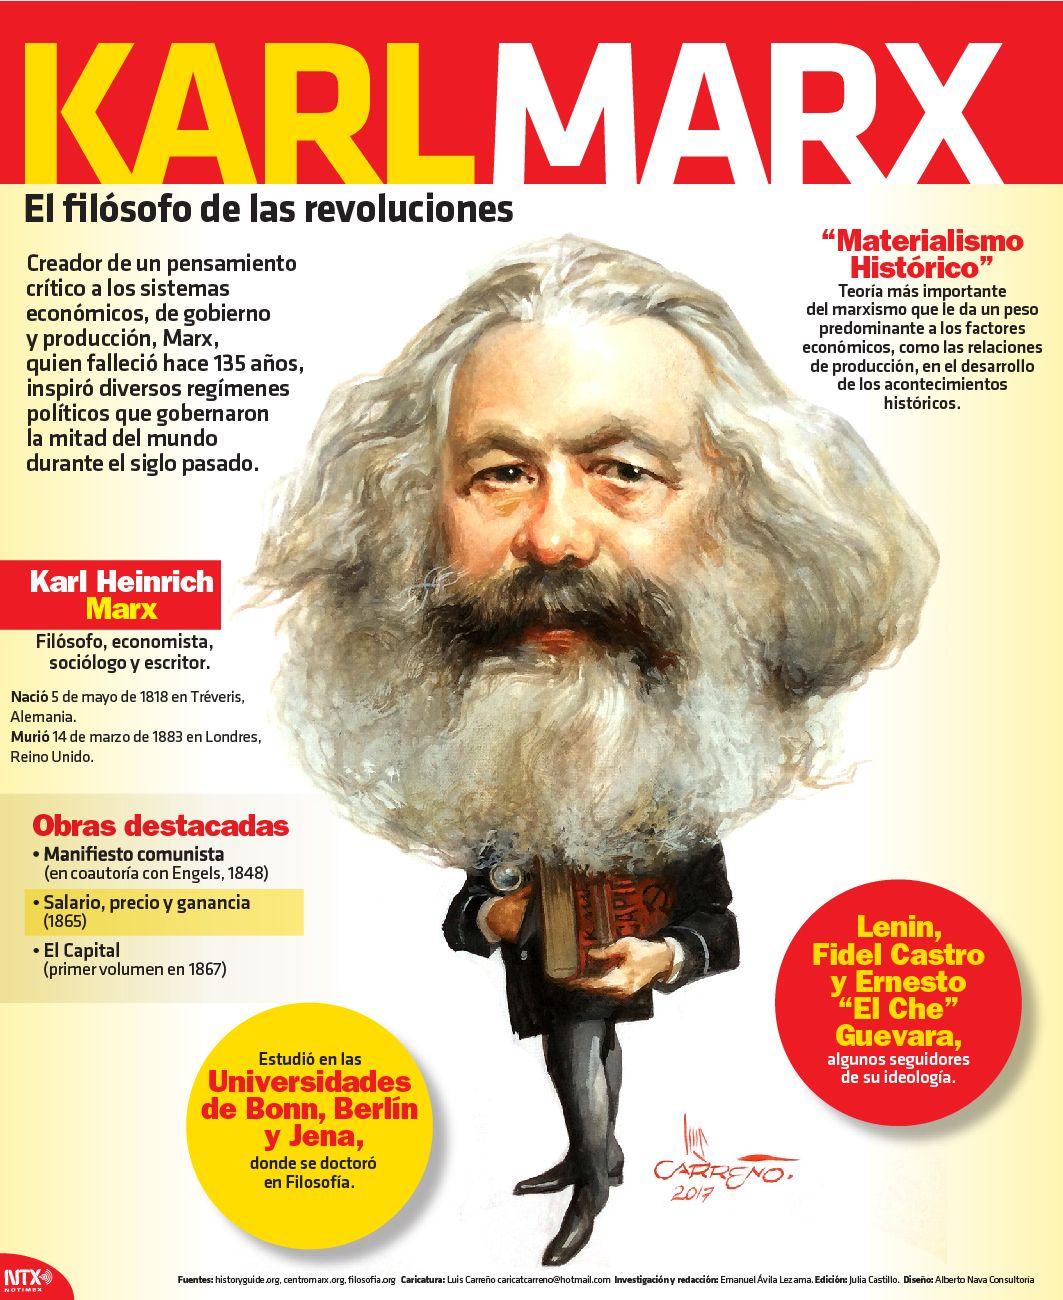 23 Ideas De Comunismo Historia Universal Contemporanea Karl Marx Personajes De La Historia